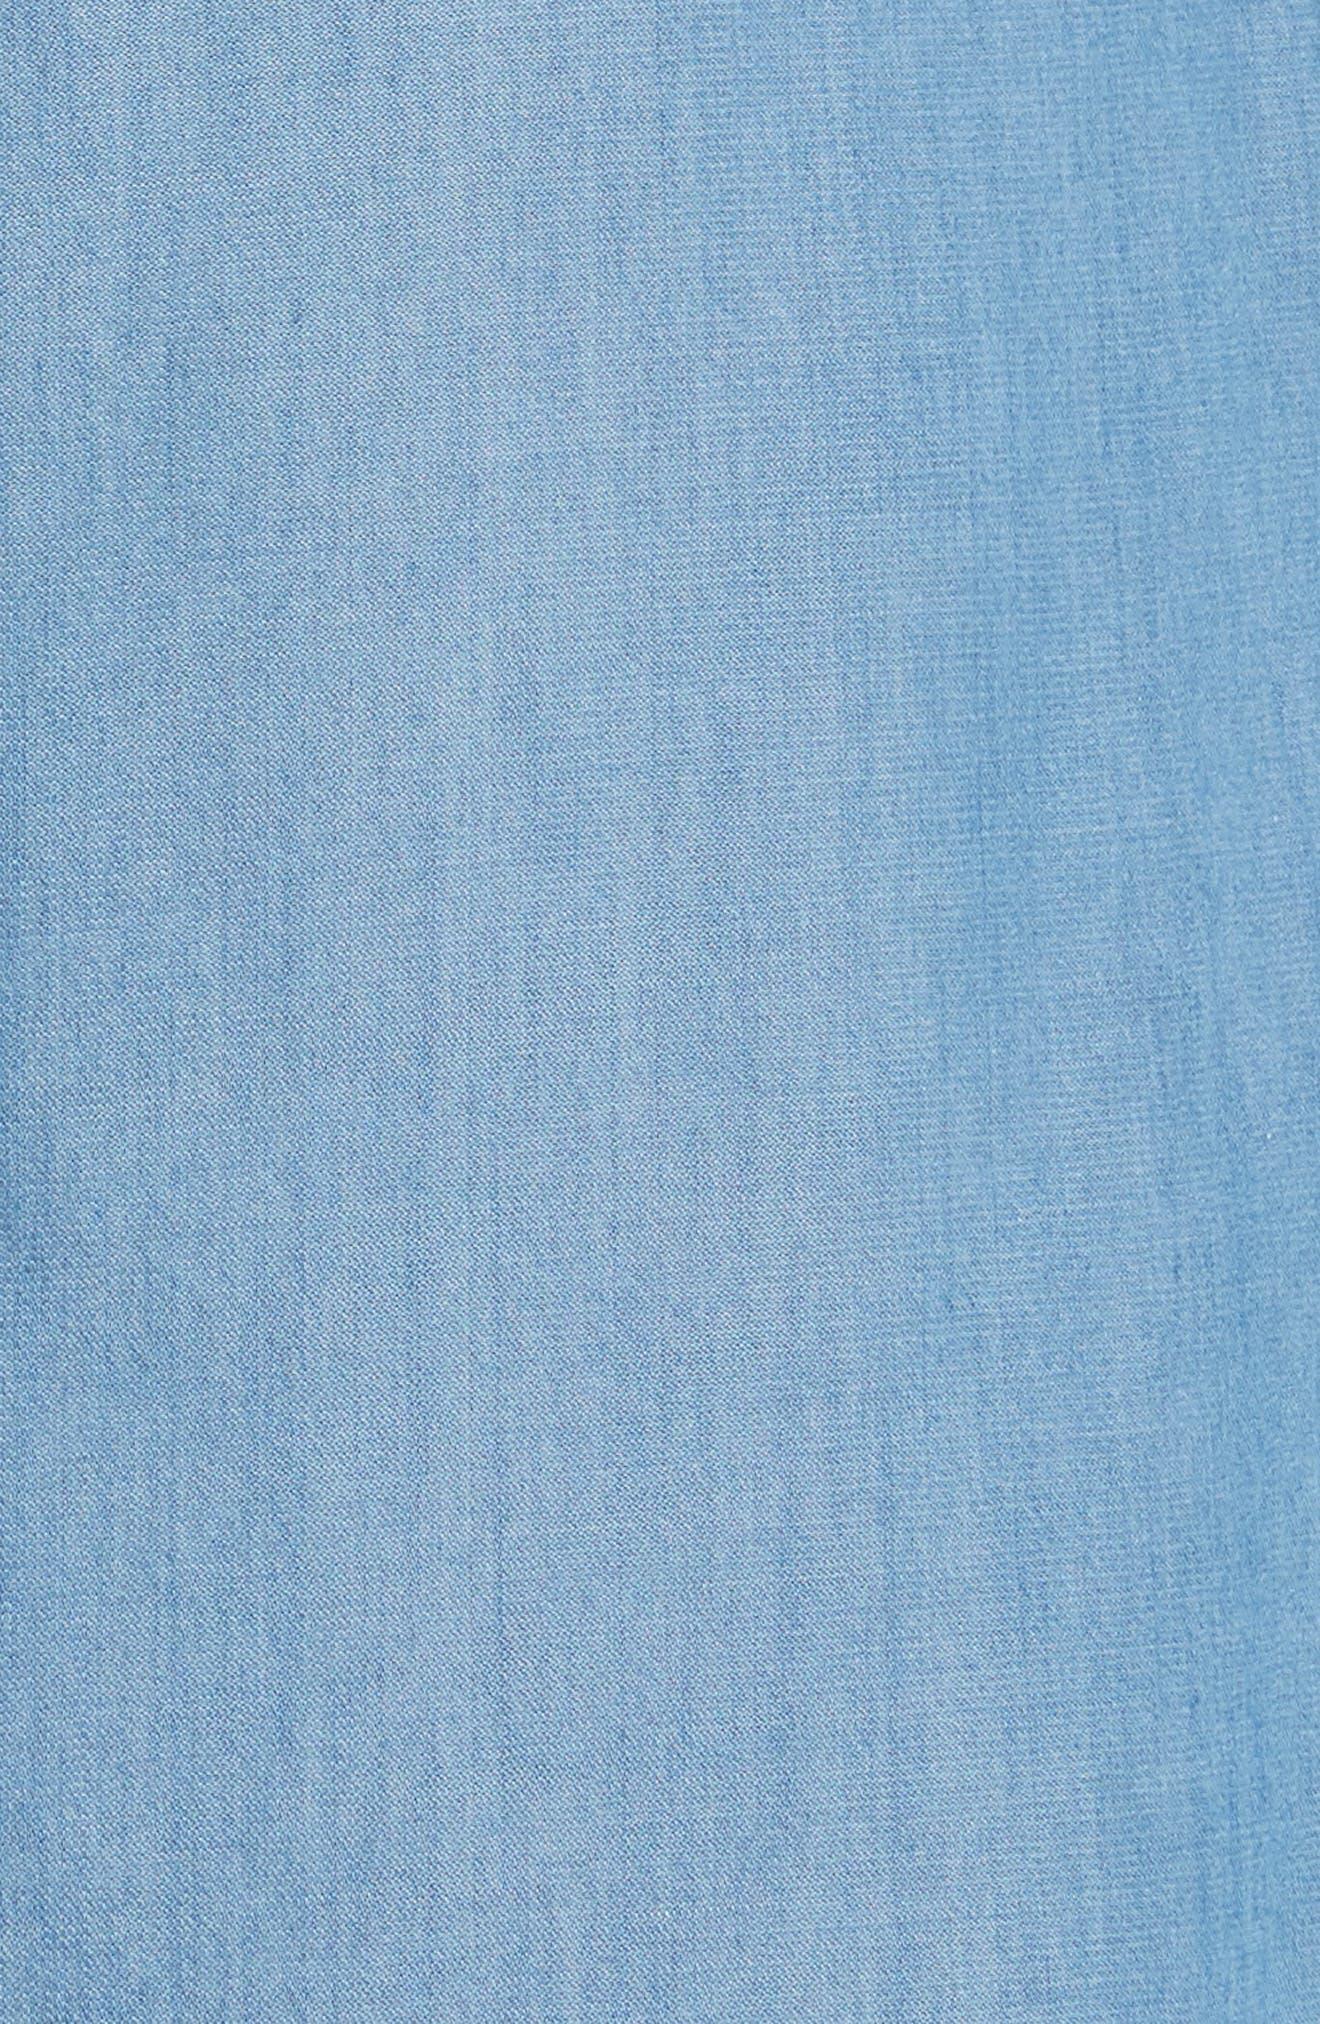 Cotton & Cashmere Chambray Shirtdress,                             Alternate thumbnail 6, color,                             Denim Blue